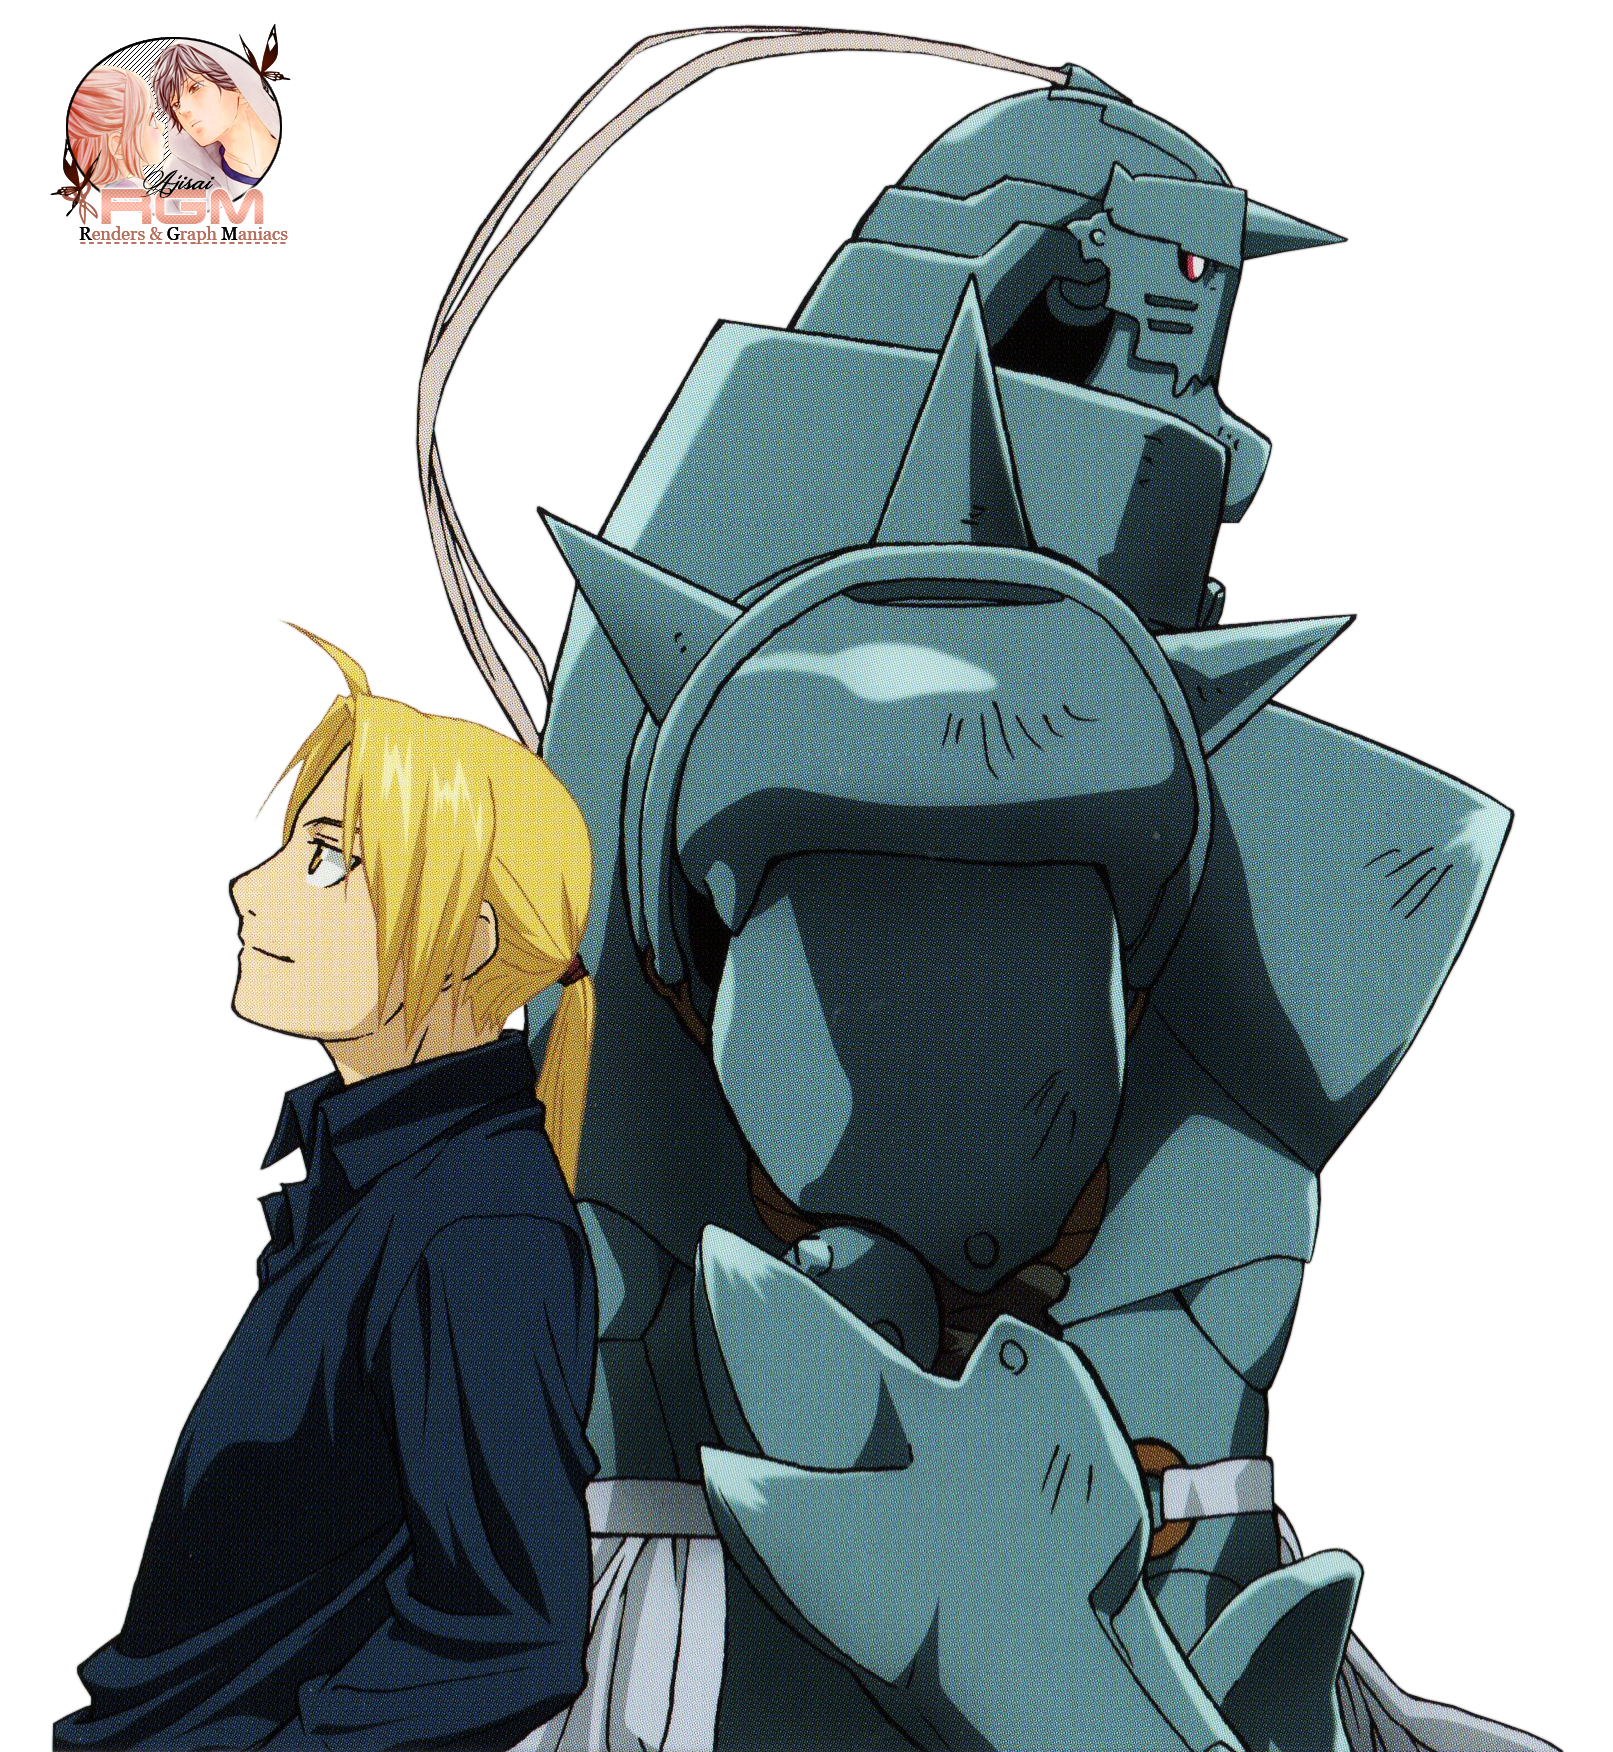 Edward and Alphonse Elric - Fullmetal Alchemist ... Fullmetal Alchemist Alphonse Elric